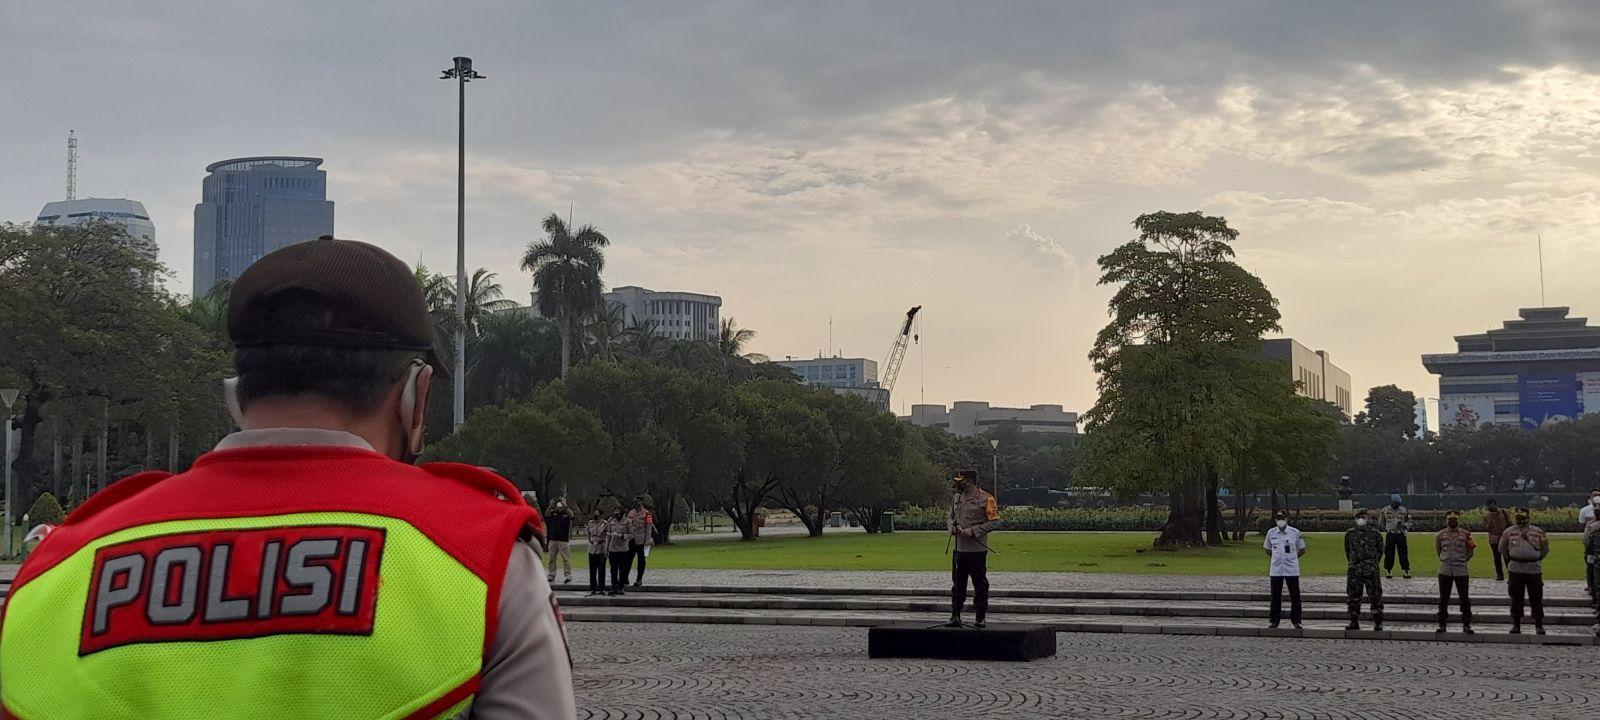 Polres Jakpus Sebar 1300 Personil Gabungan Cegah Takbiran Keliling. Foto: Andri Bagus/GenPI.co